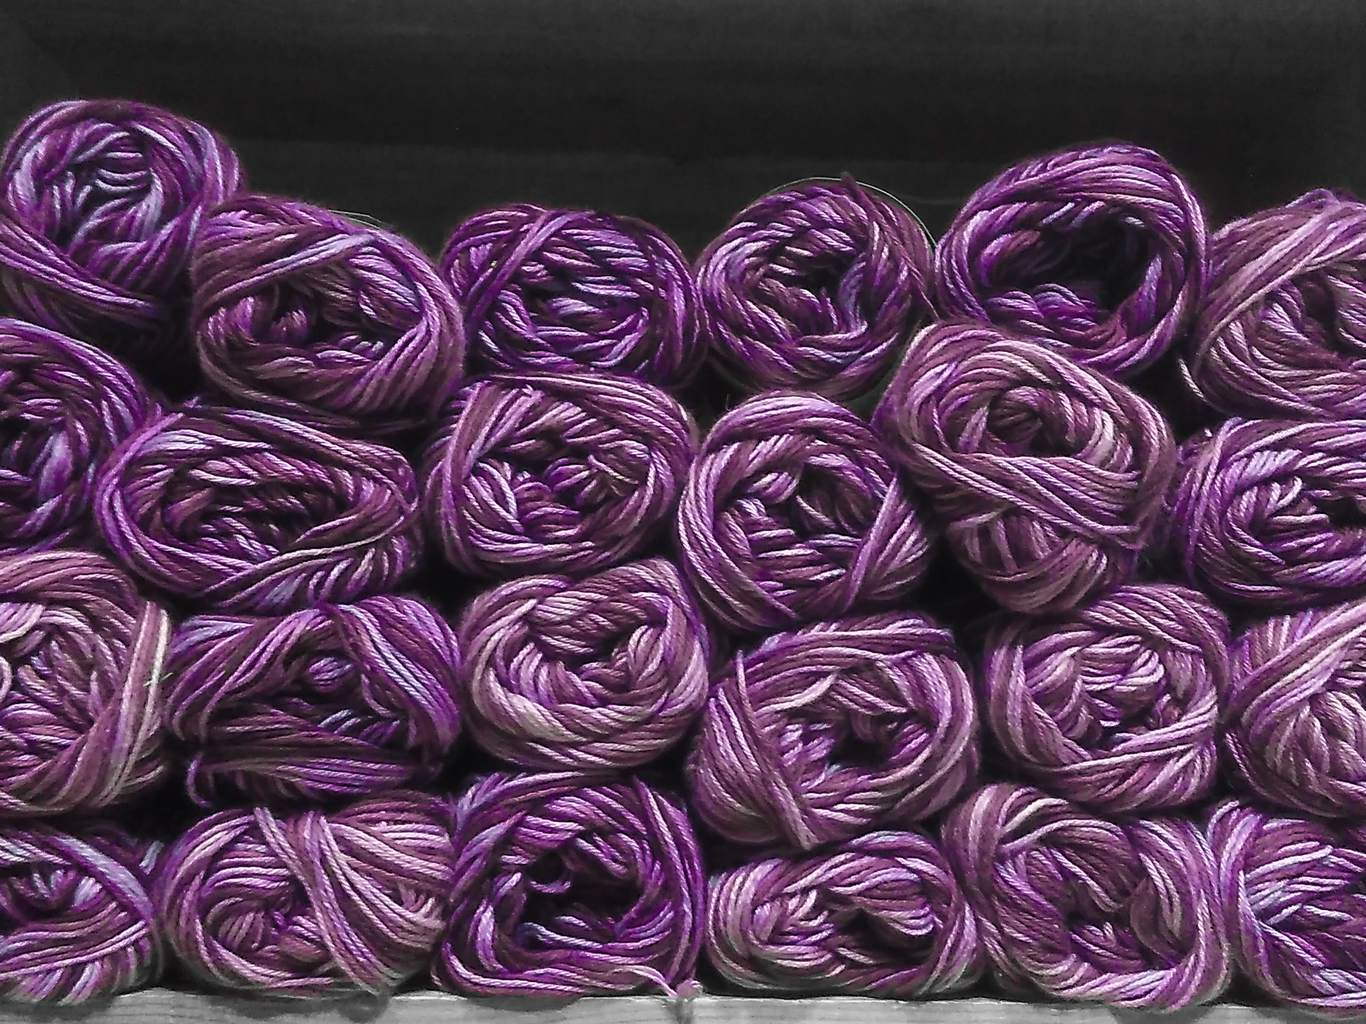 ID - violet 2